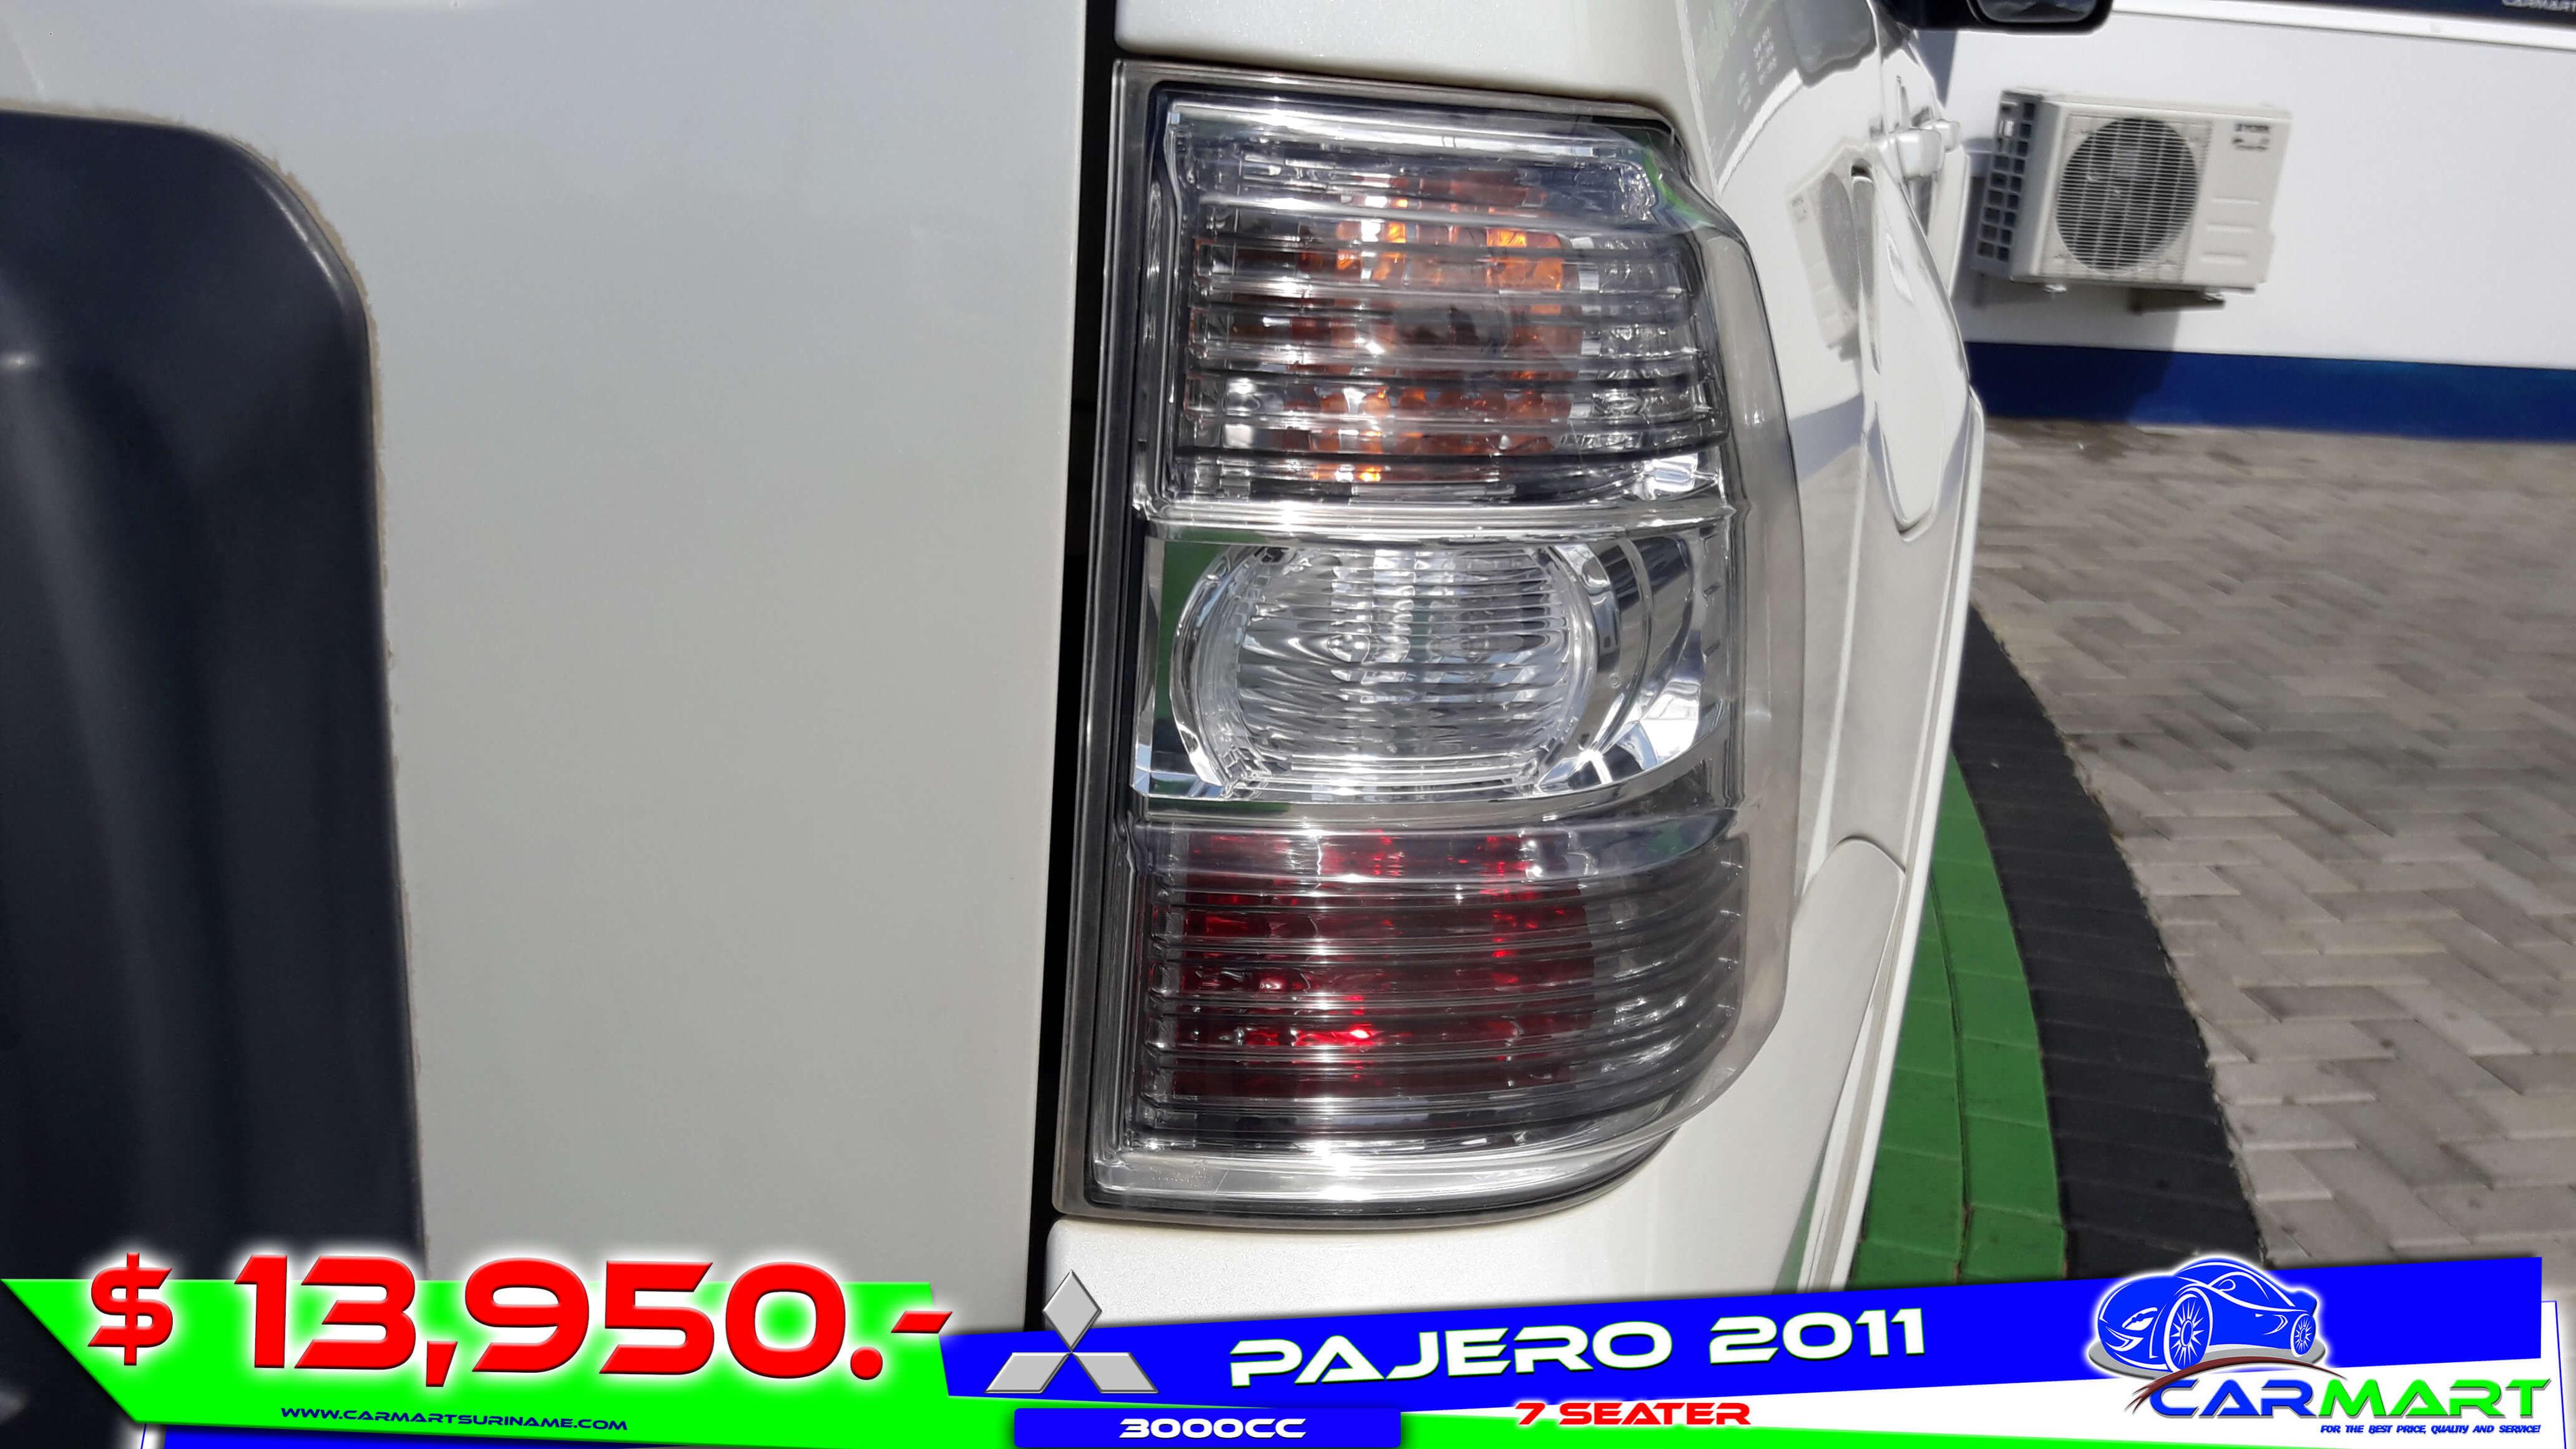 Mitsubishi Pajero 2011 Carmart Suriname